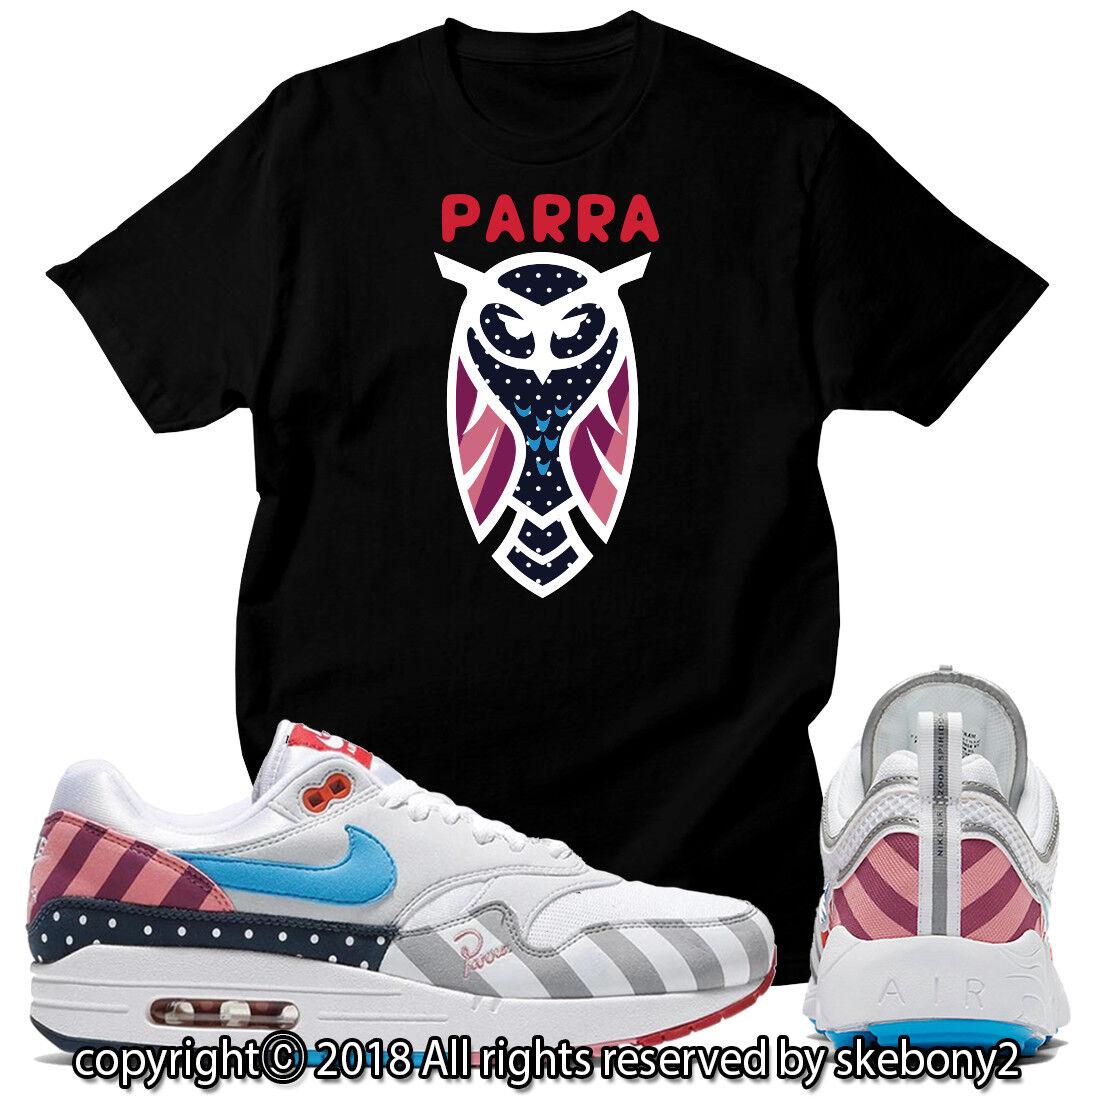 brand new 554a3 fbfee NYTT TÄVLAD x T-SHIRT som matchar Parra JD x NYTT Nike Air Max 1 och  Spiridon JD 1-19-5